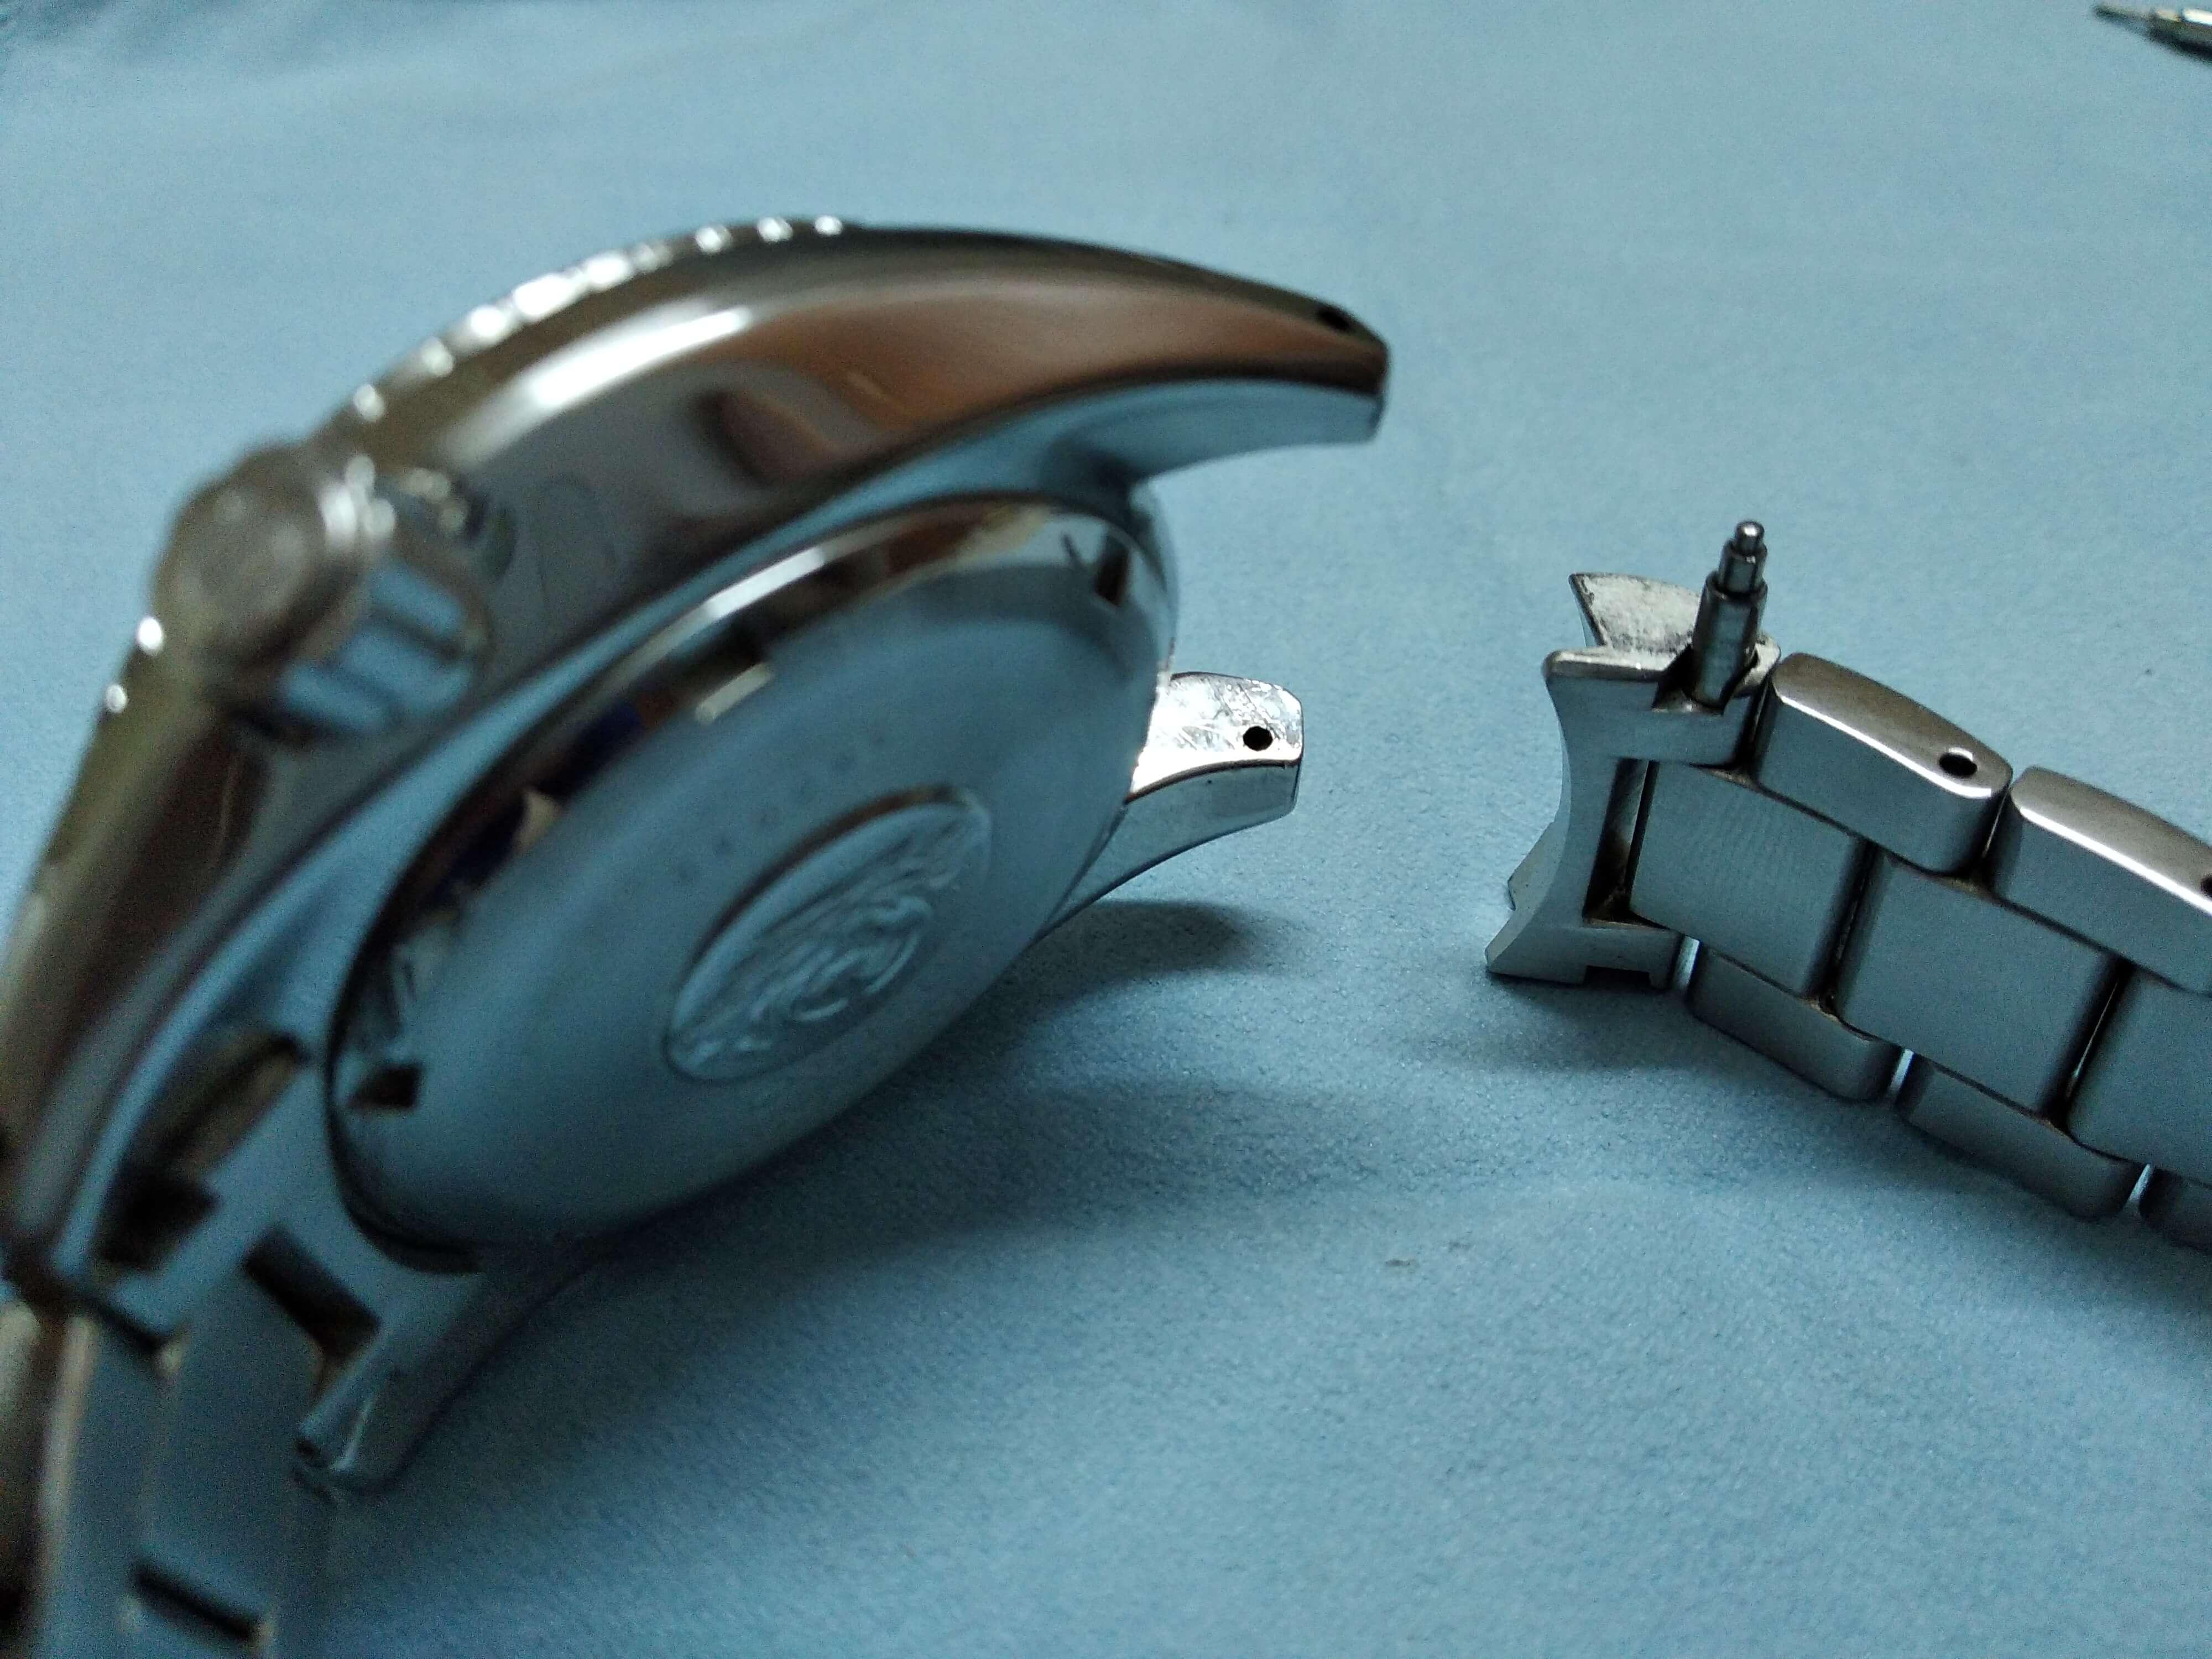 Seiko Bracelet Removal 3